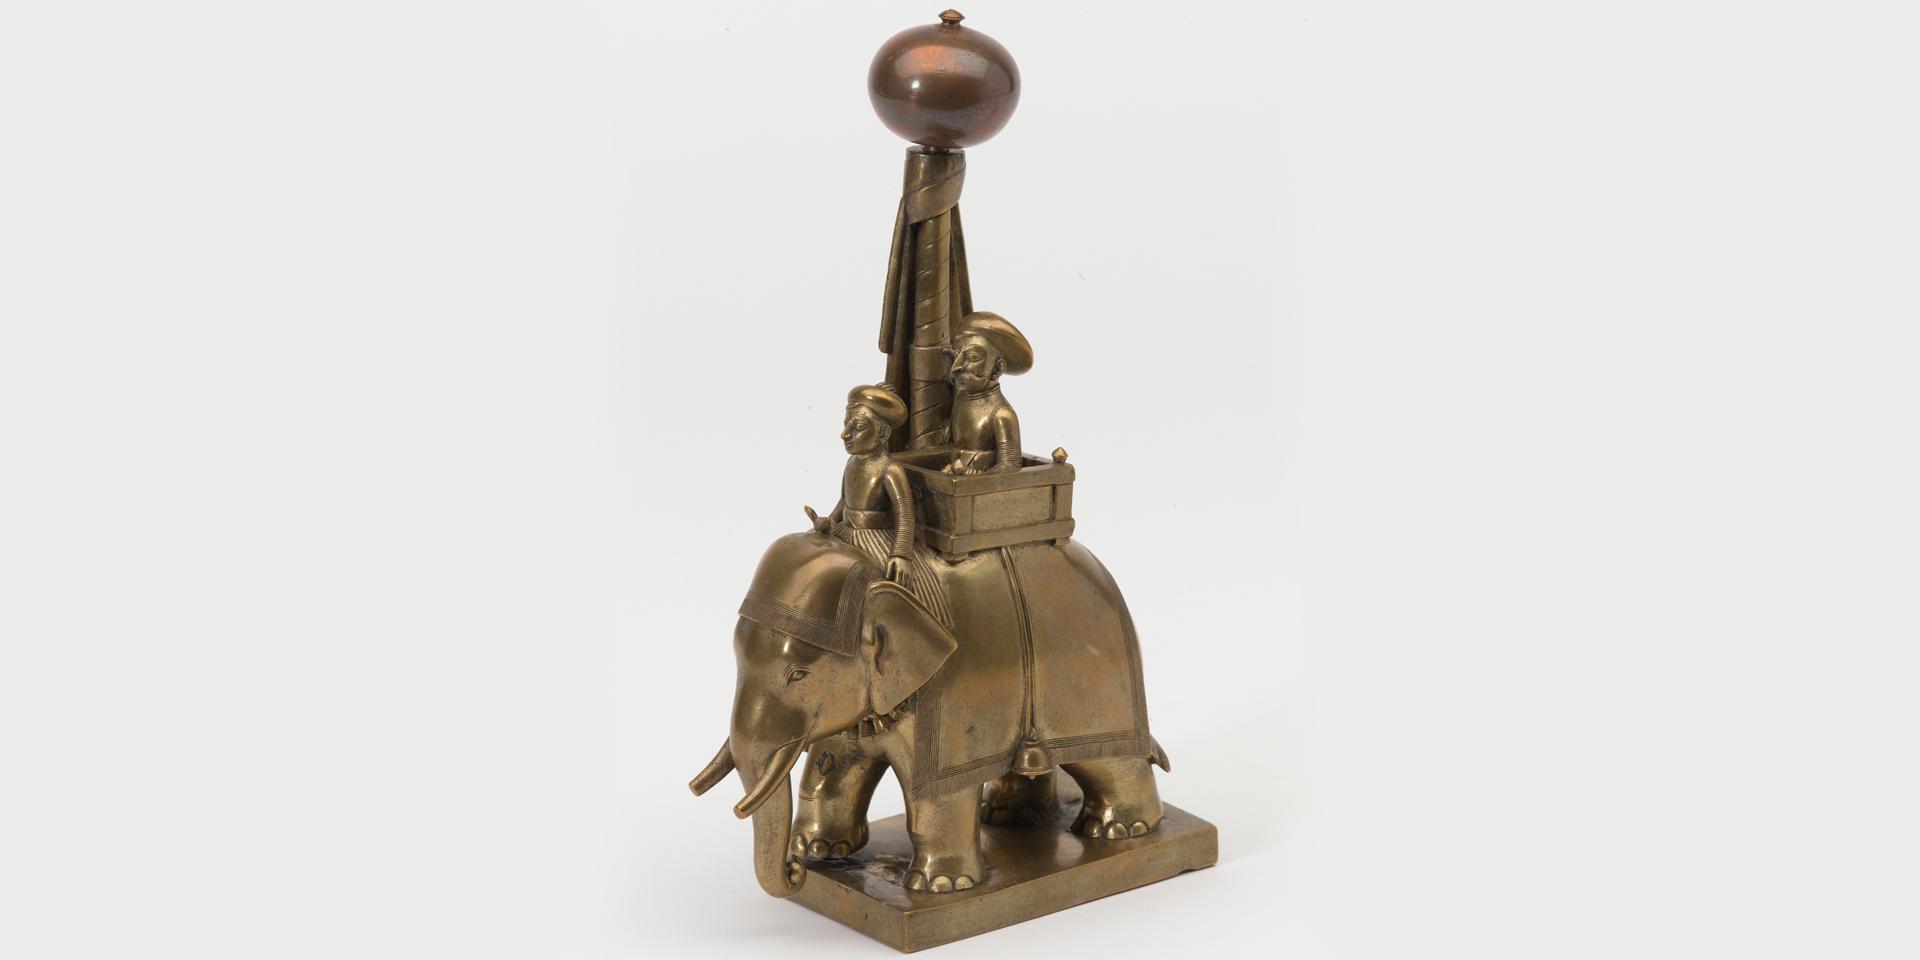 Solid-cast bronze war elephant, c1795